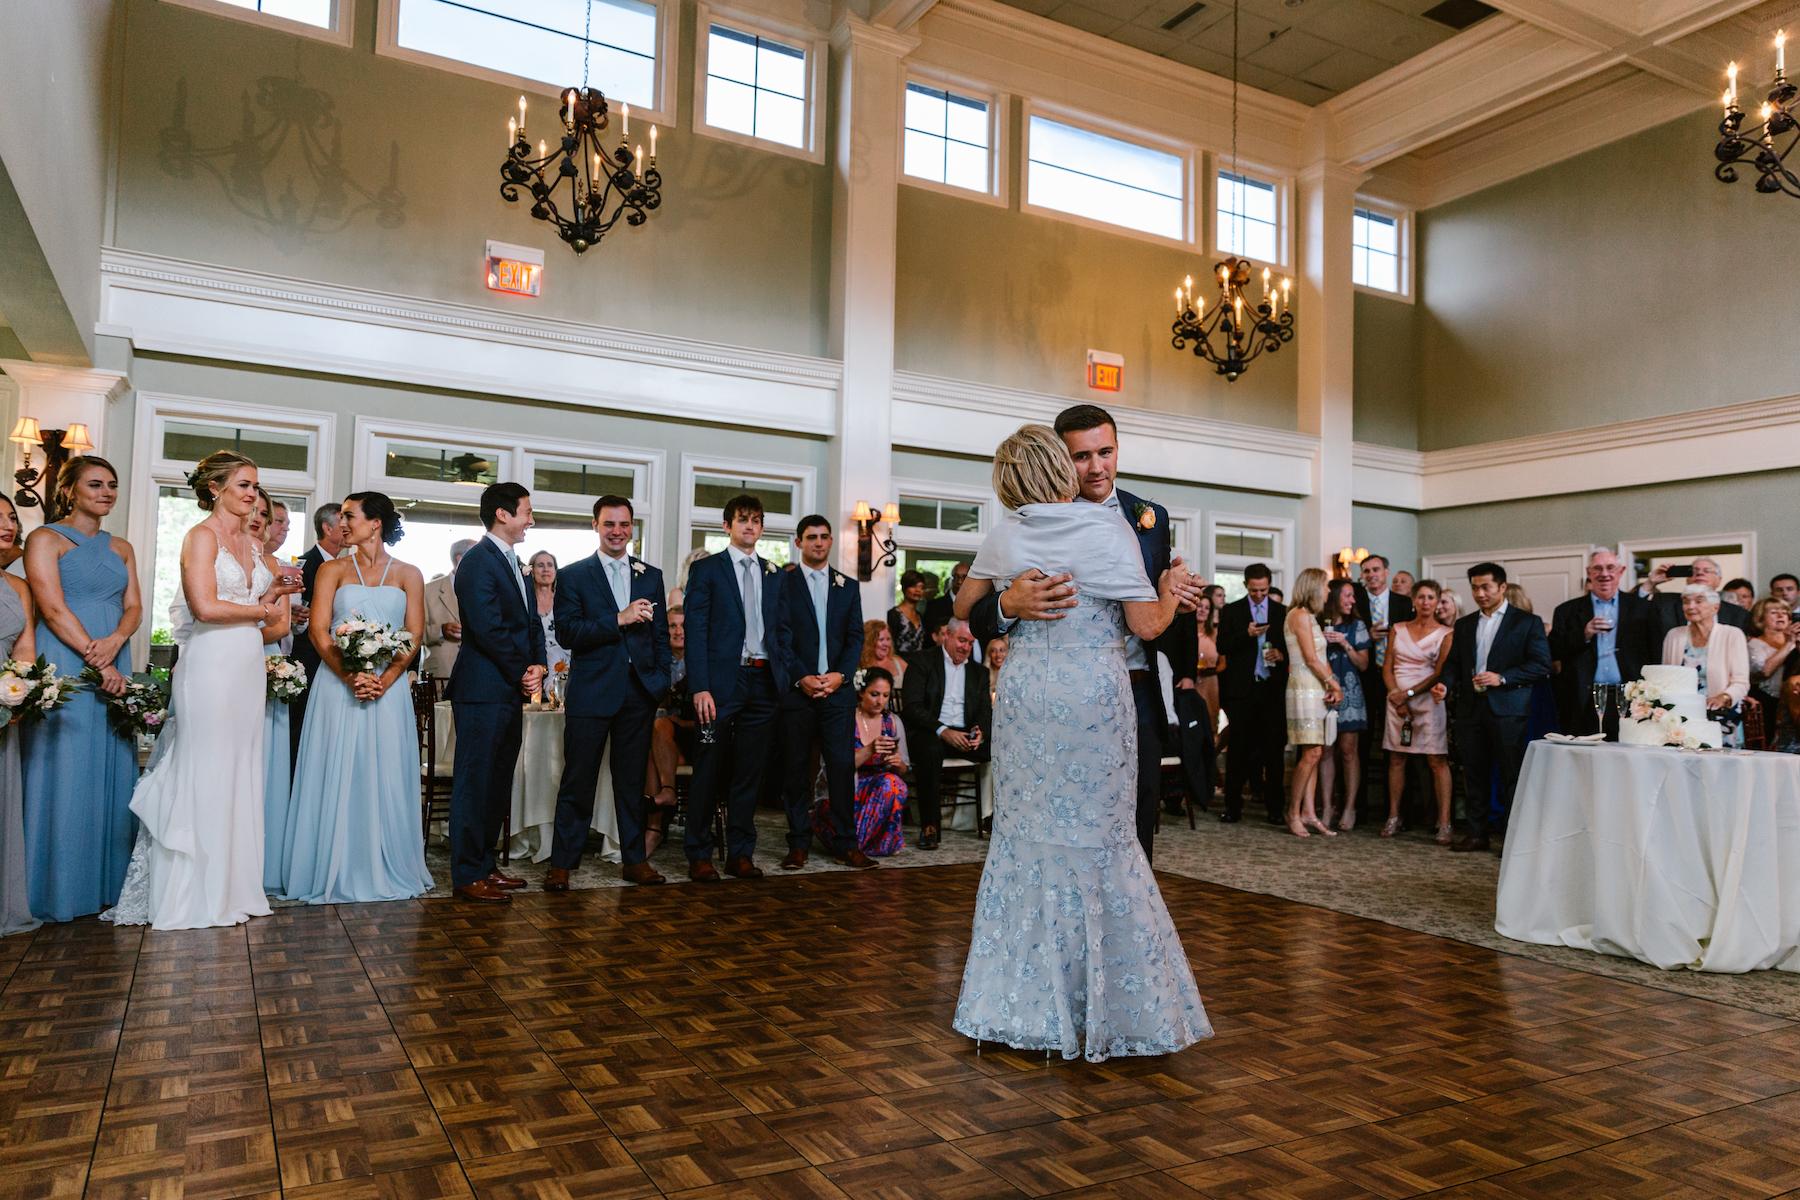 wedding-engagement-photographer-spartanburg-greenville-columbia-carolina-south-north-518.JPG